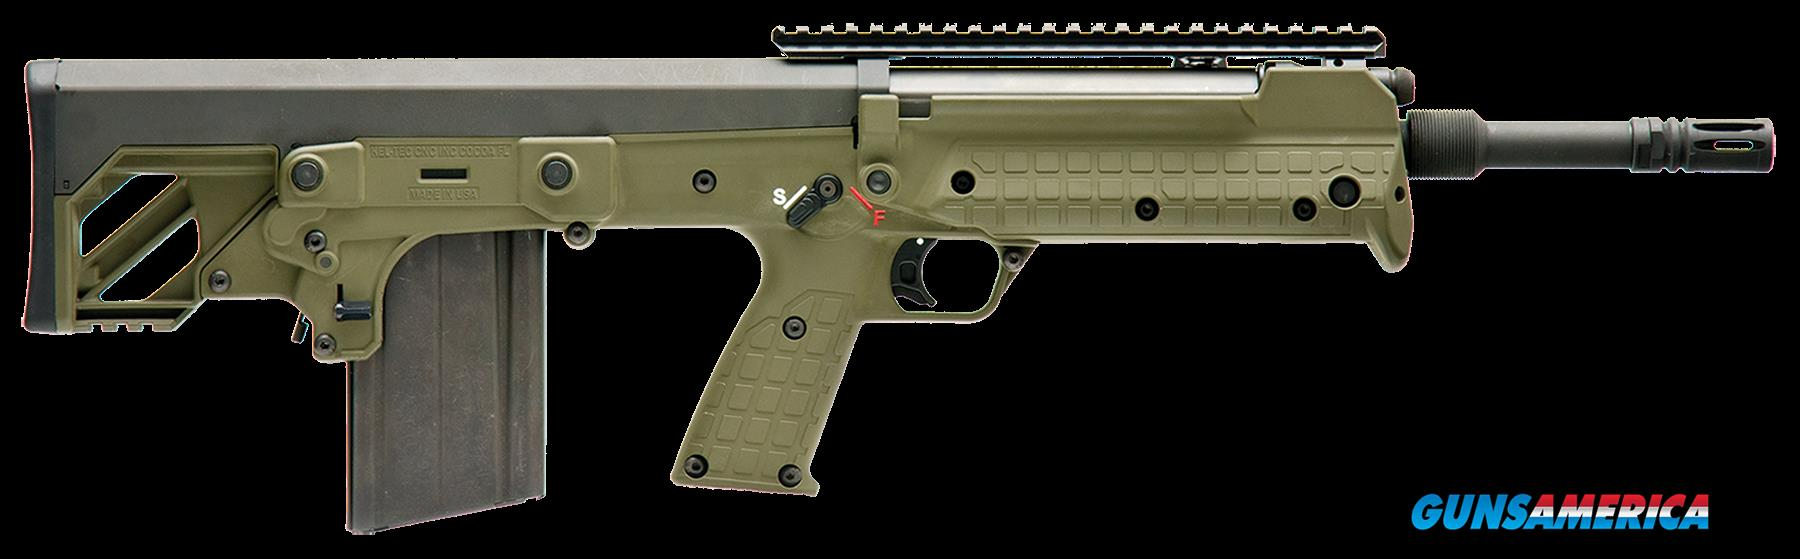 Kel-tec Rfb, Kel Rfb18tan   308 Win  18in           Cerakote  Guns > Pistols > 1911 Pistol Copies (non-Colt)